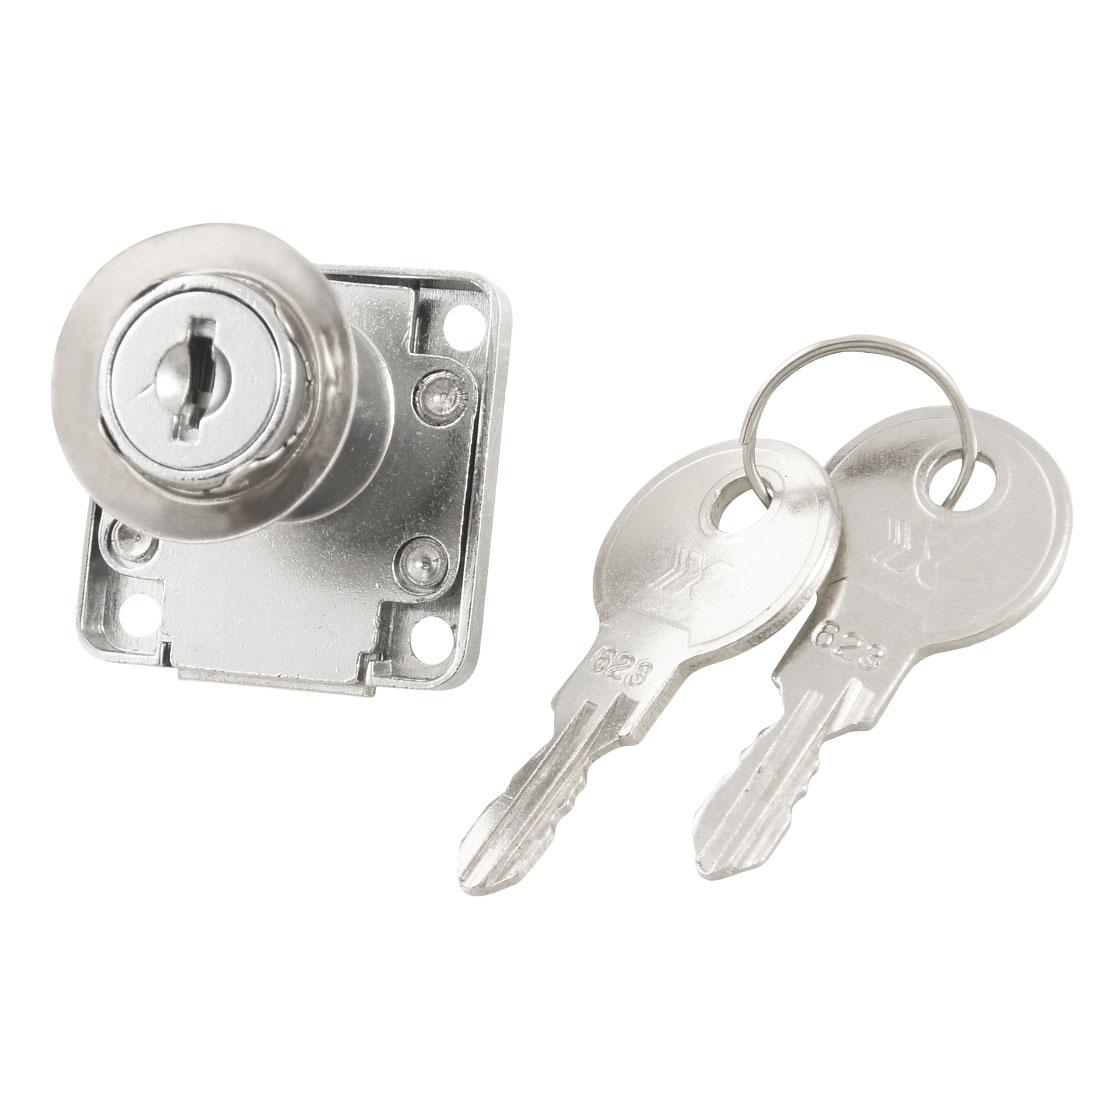 Sliver Tone Security Hardware Metal Deadbolt Drawer Locker Lock w Keys